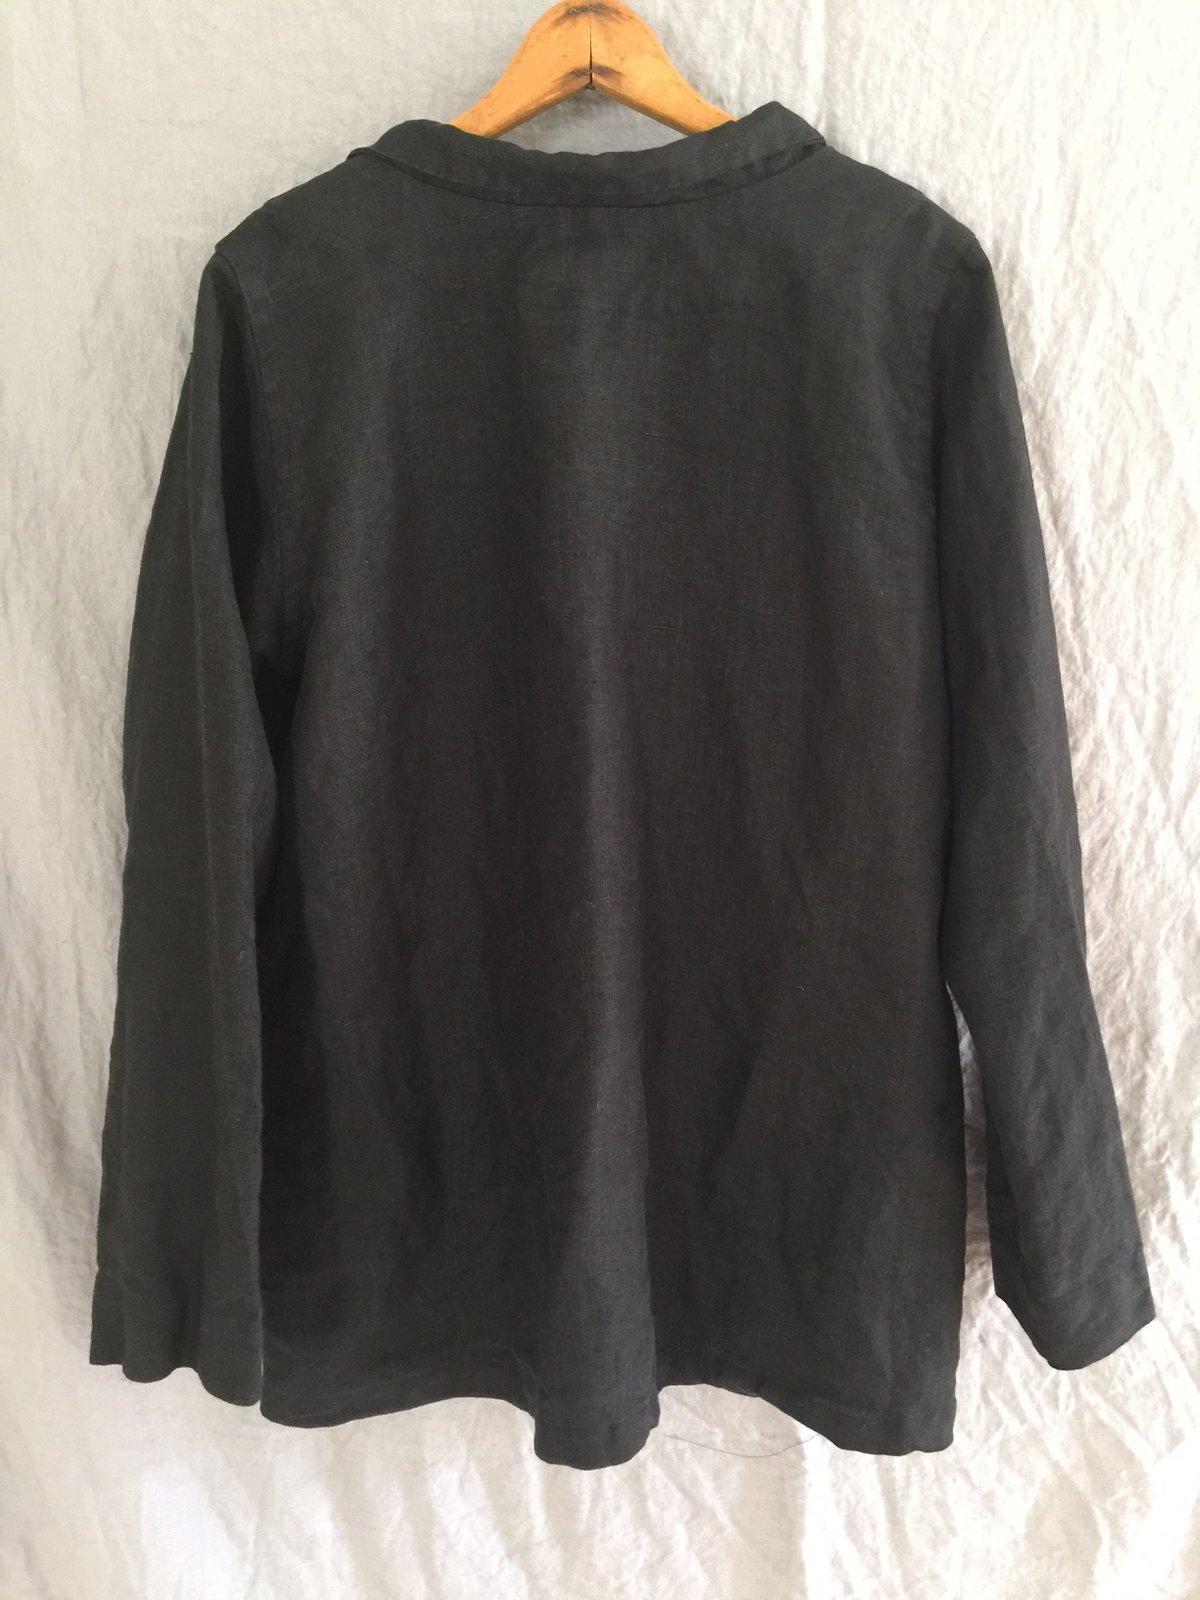 Image of linen jacket